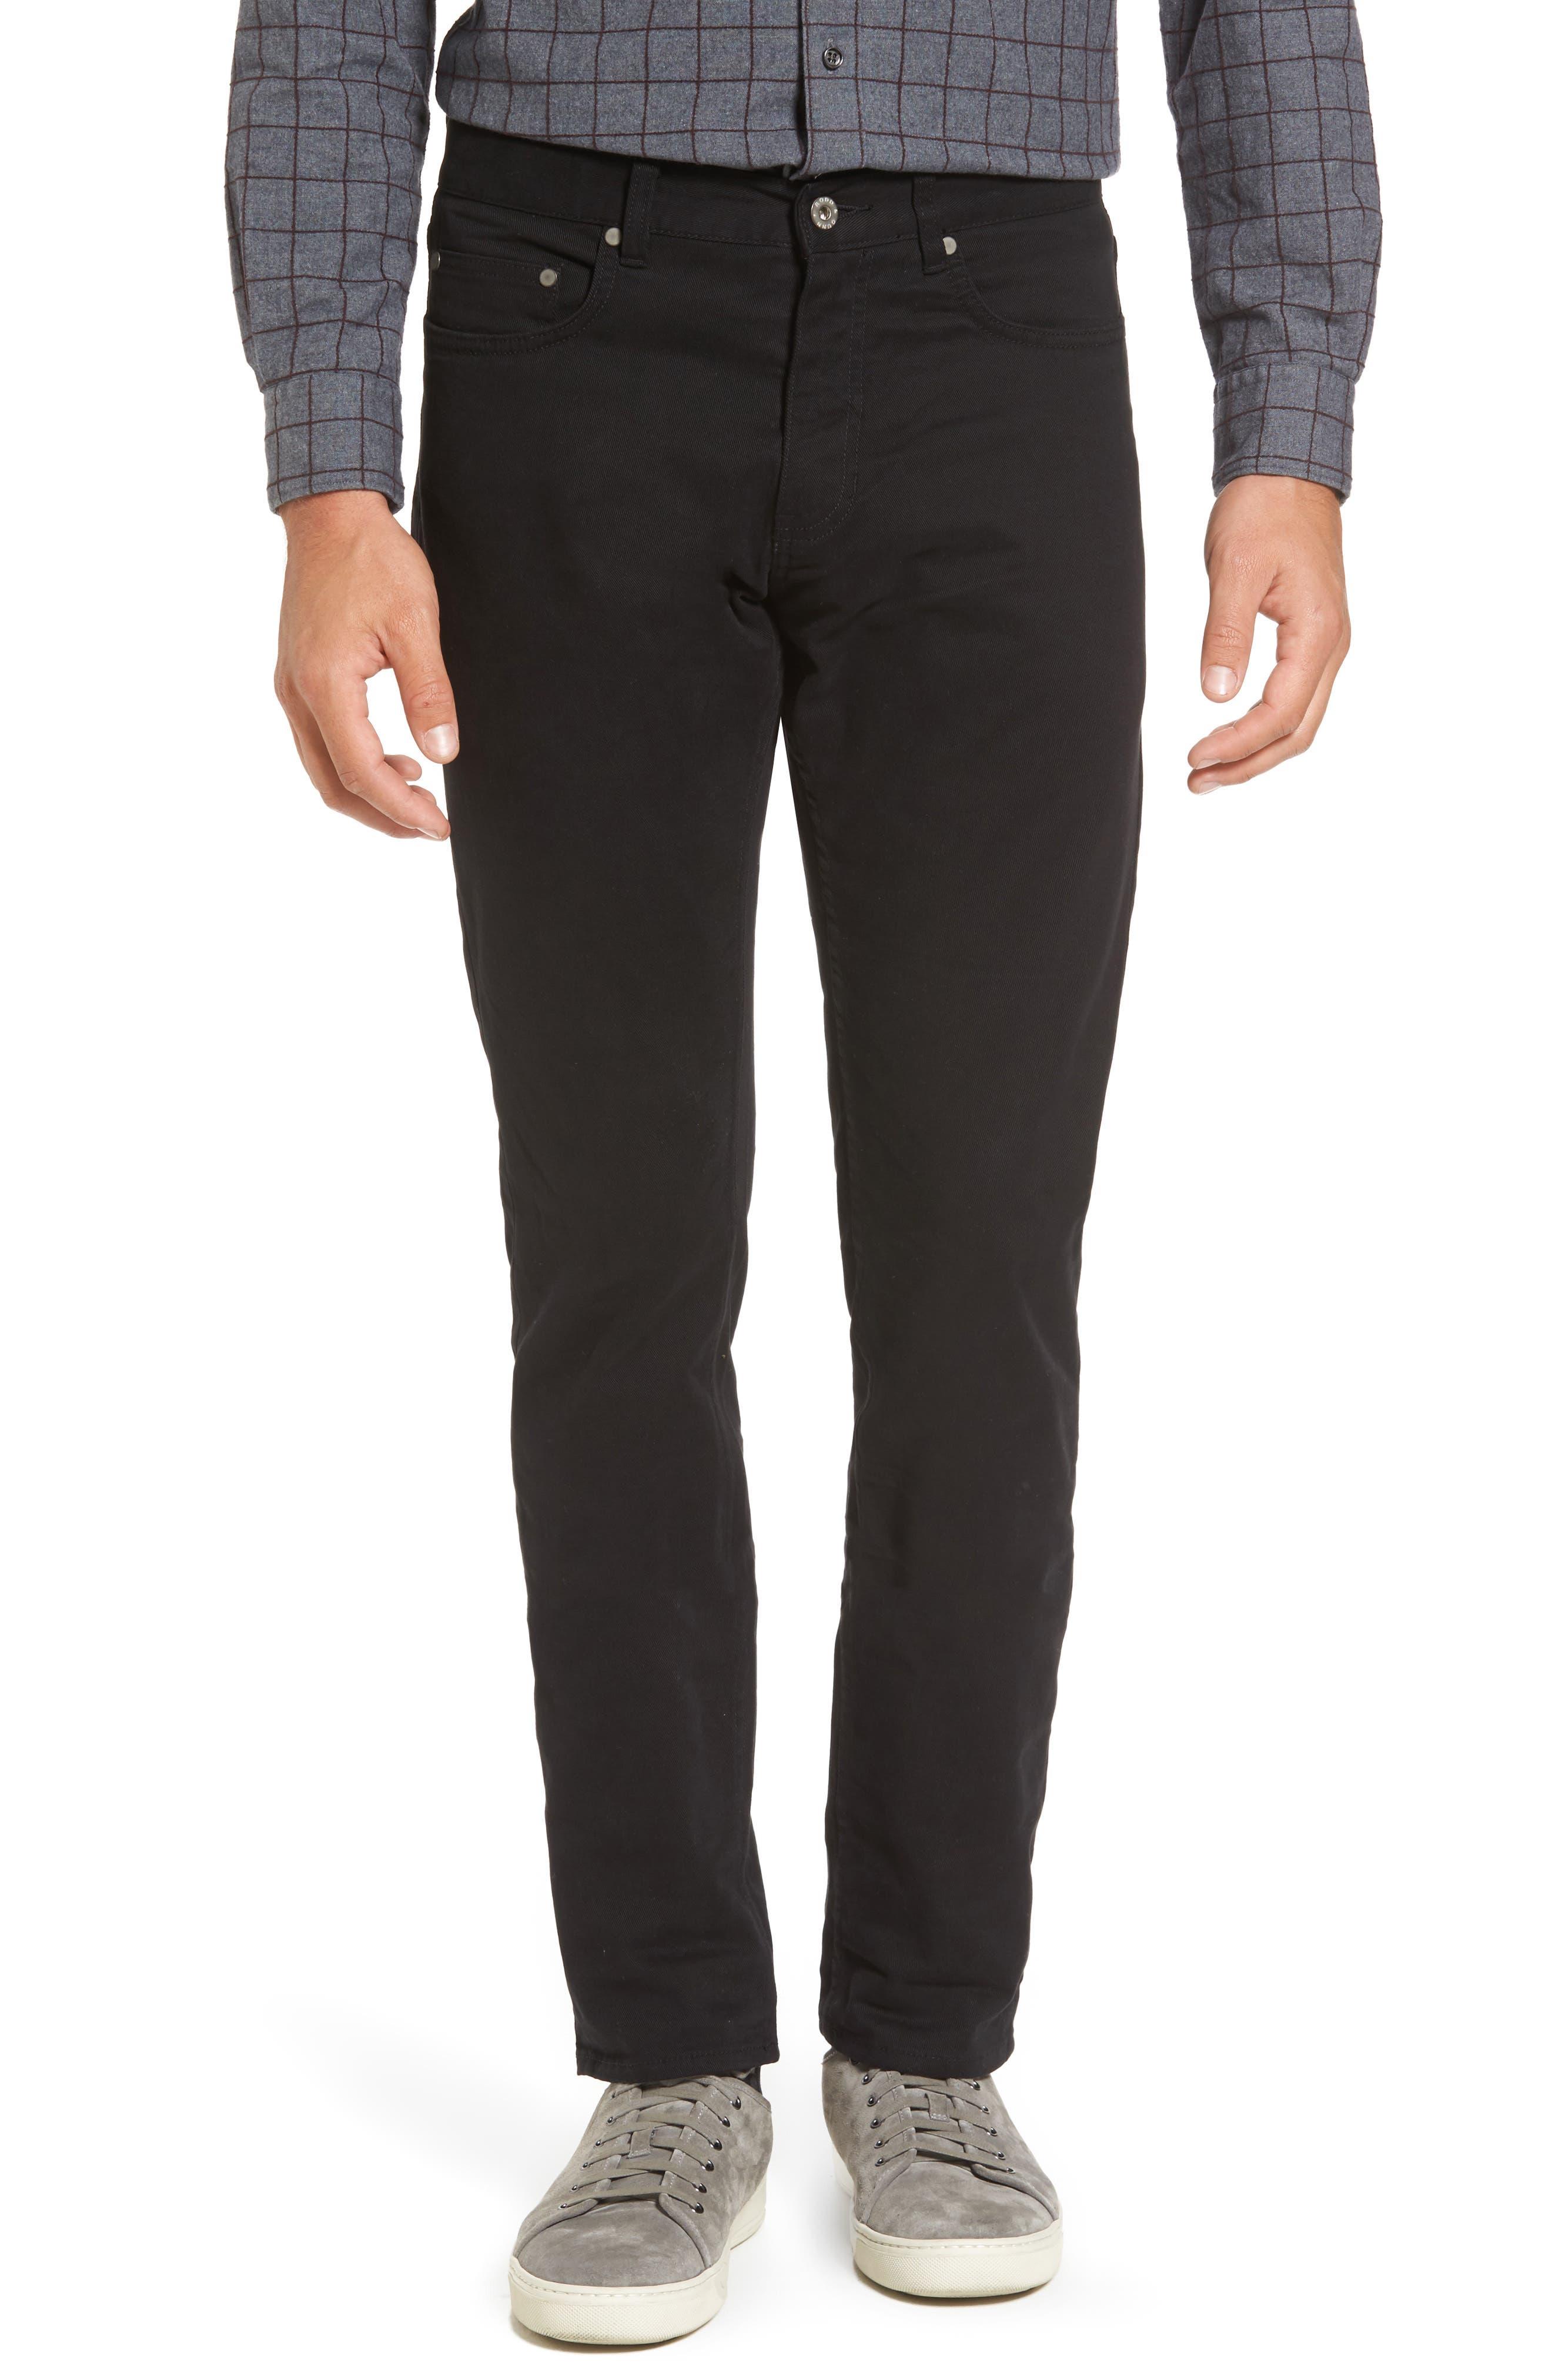 Rodd & Gunn 'Barters' Straight Leg Twill Pants